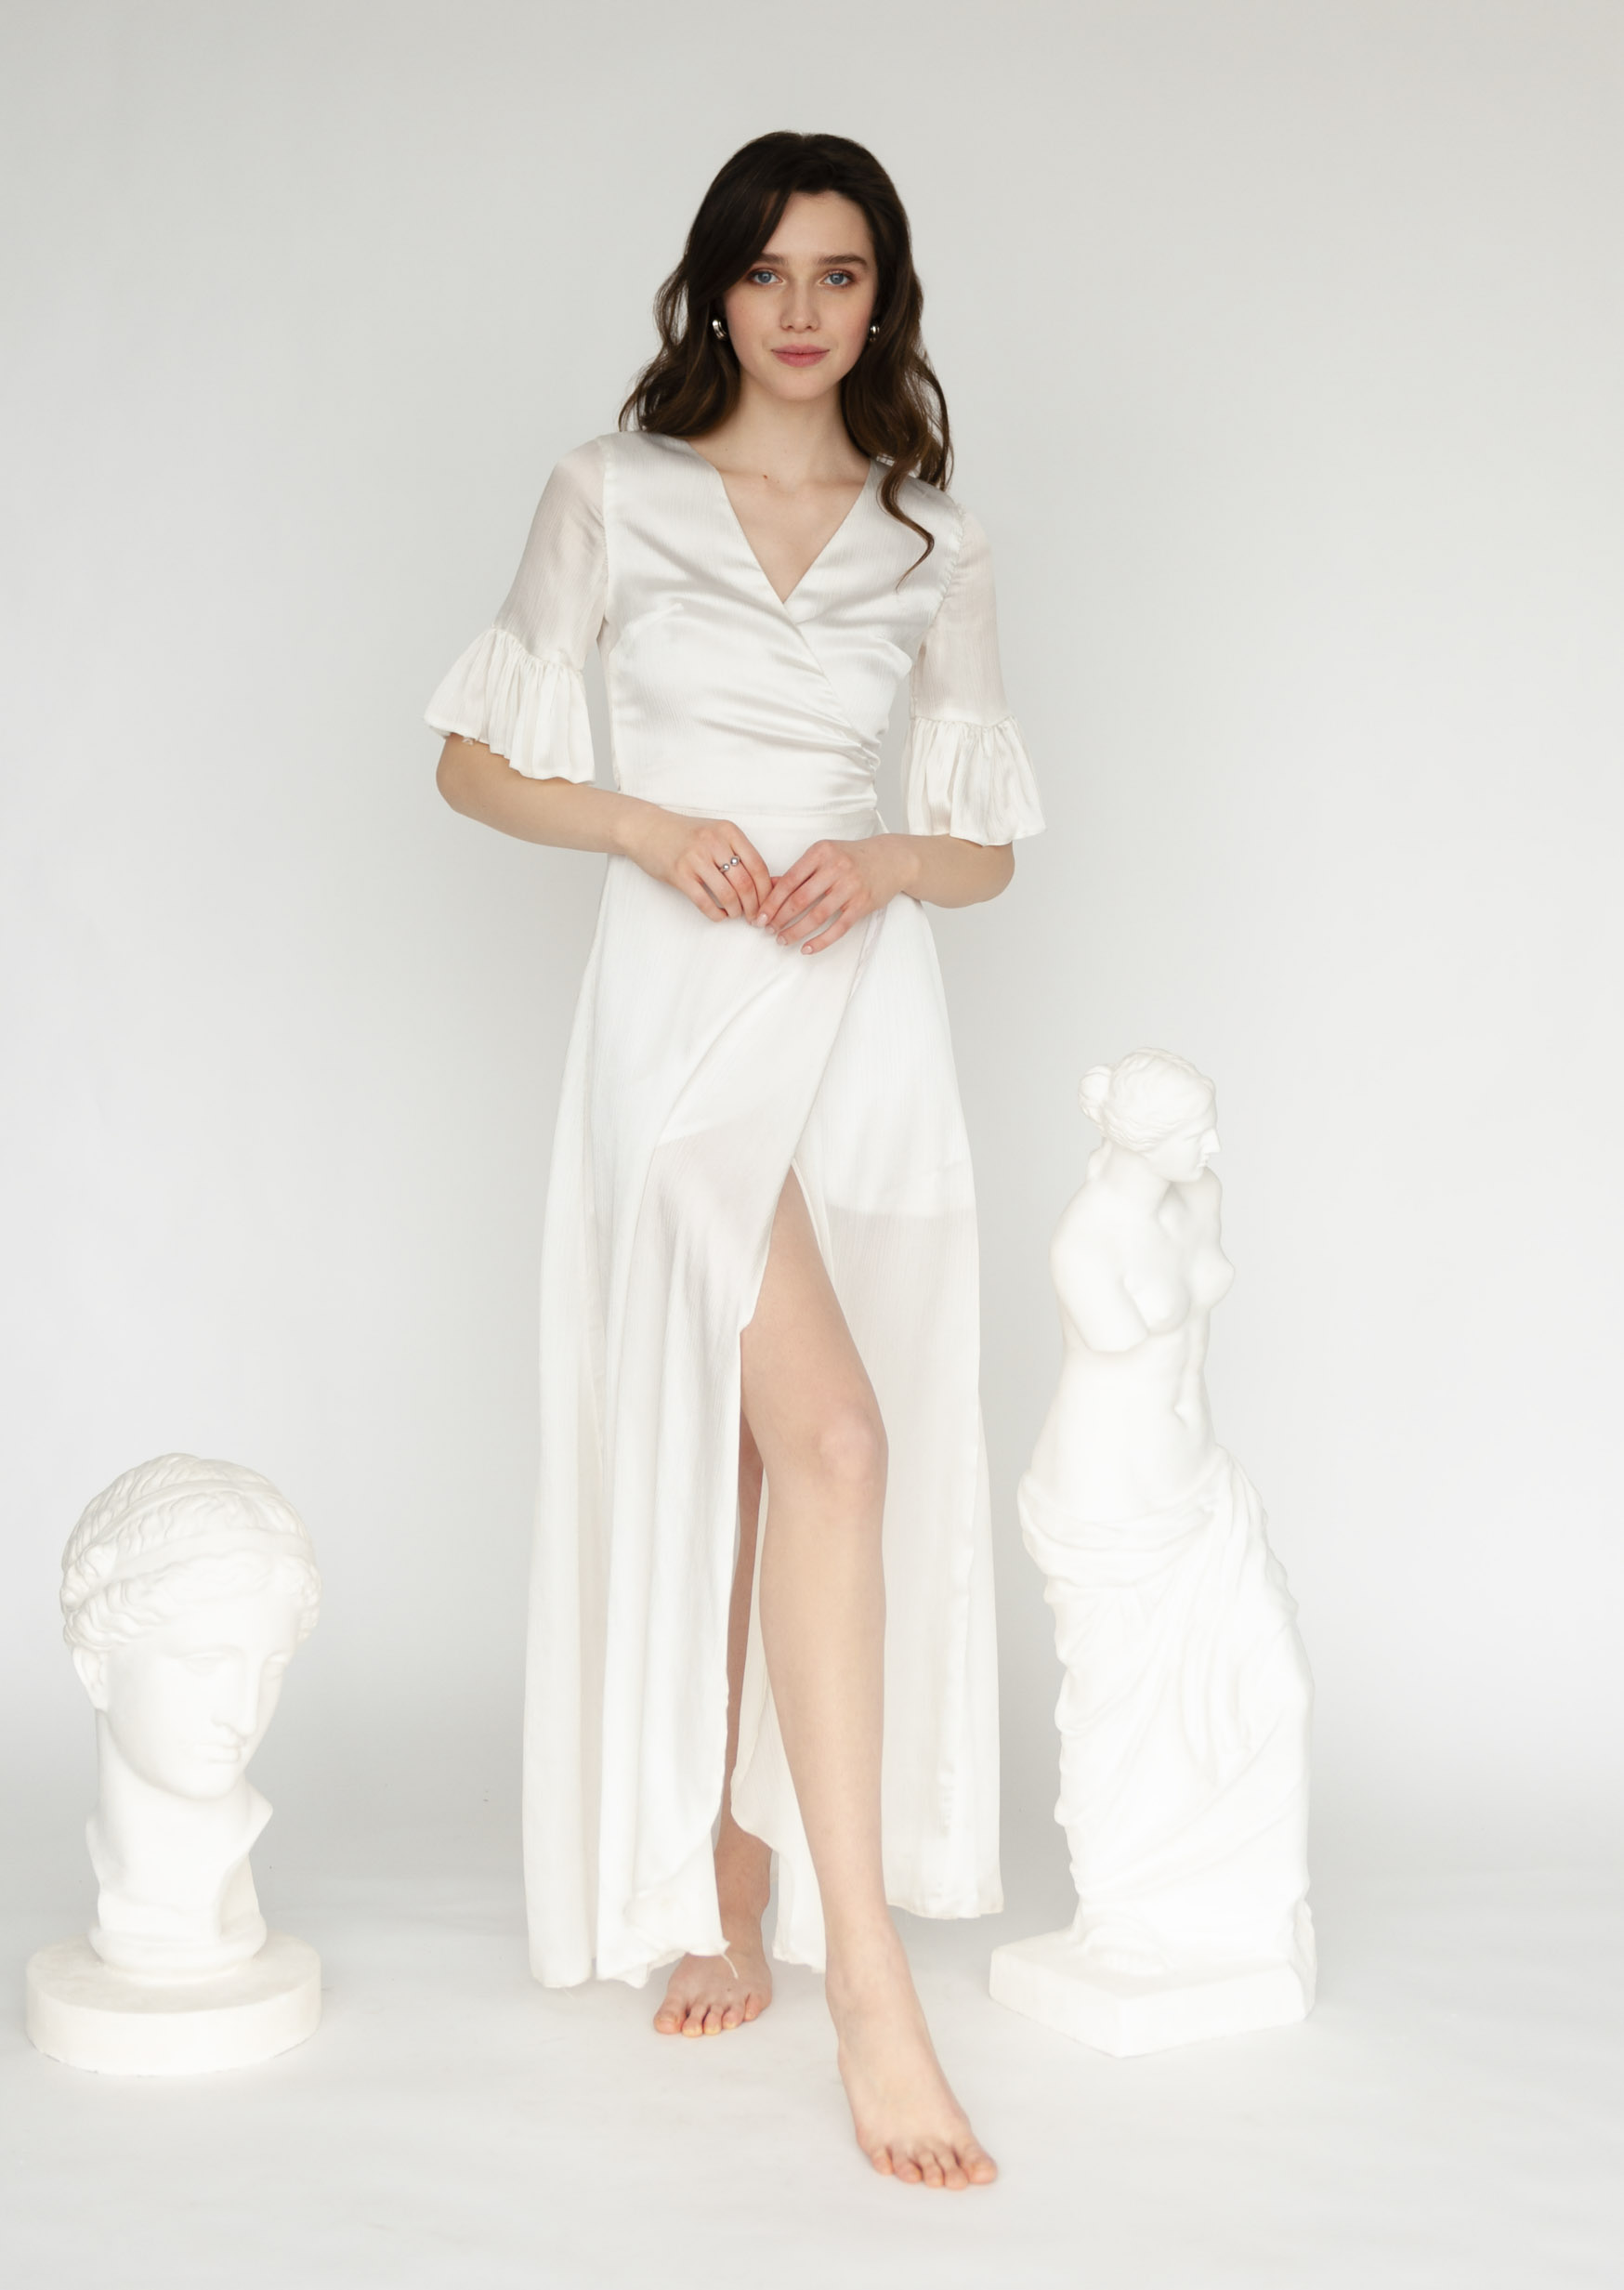 Seashell dress white simple wedding asymmetrical dress